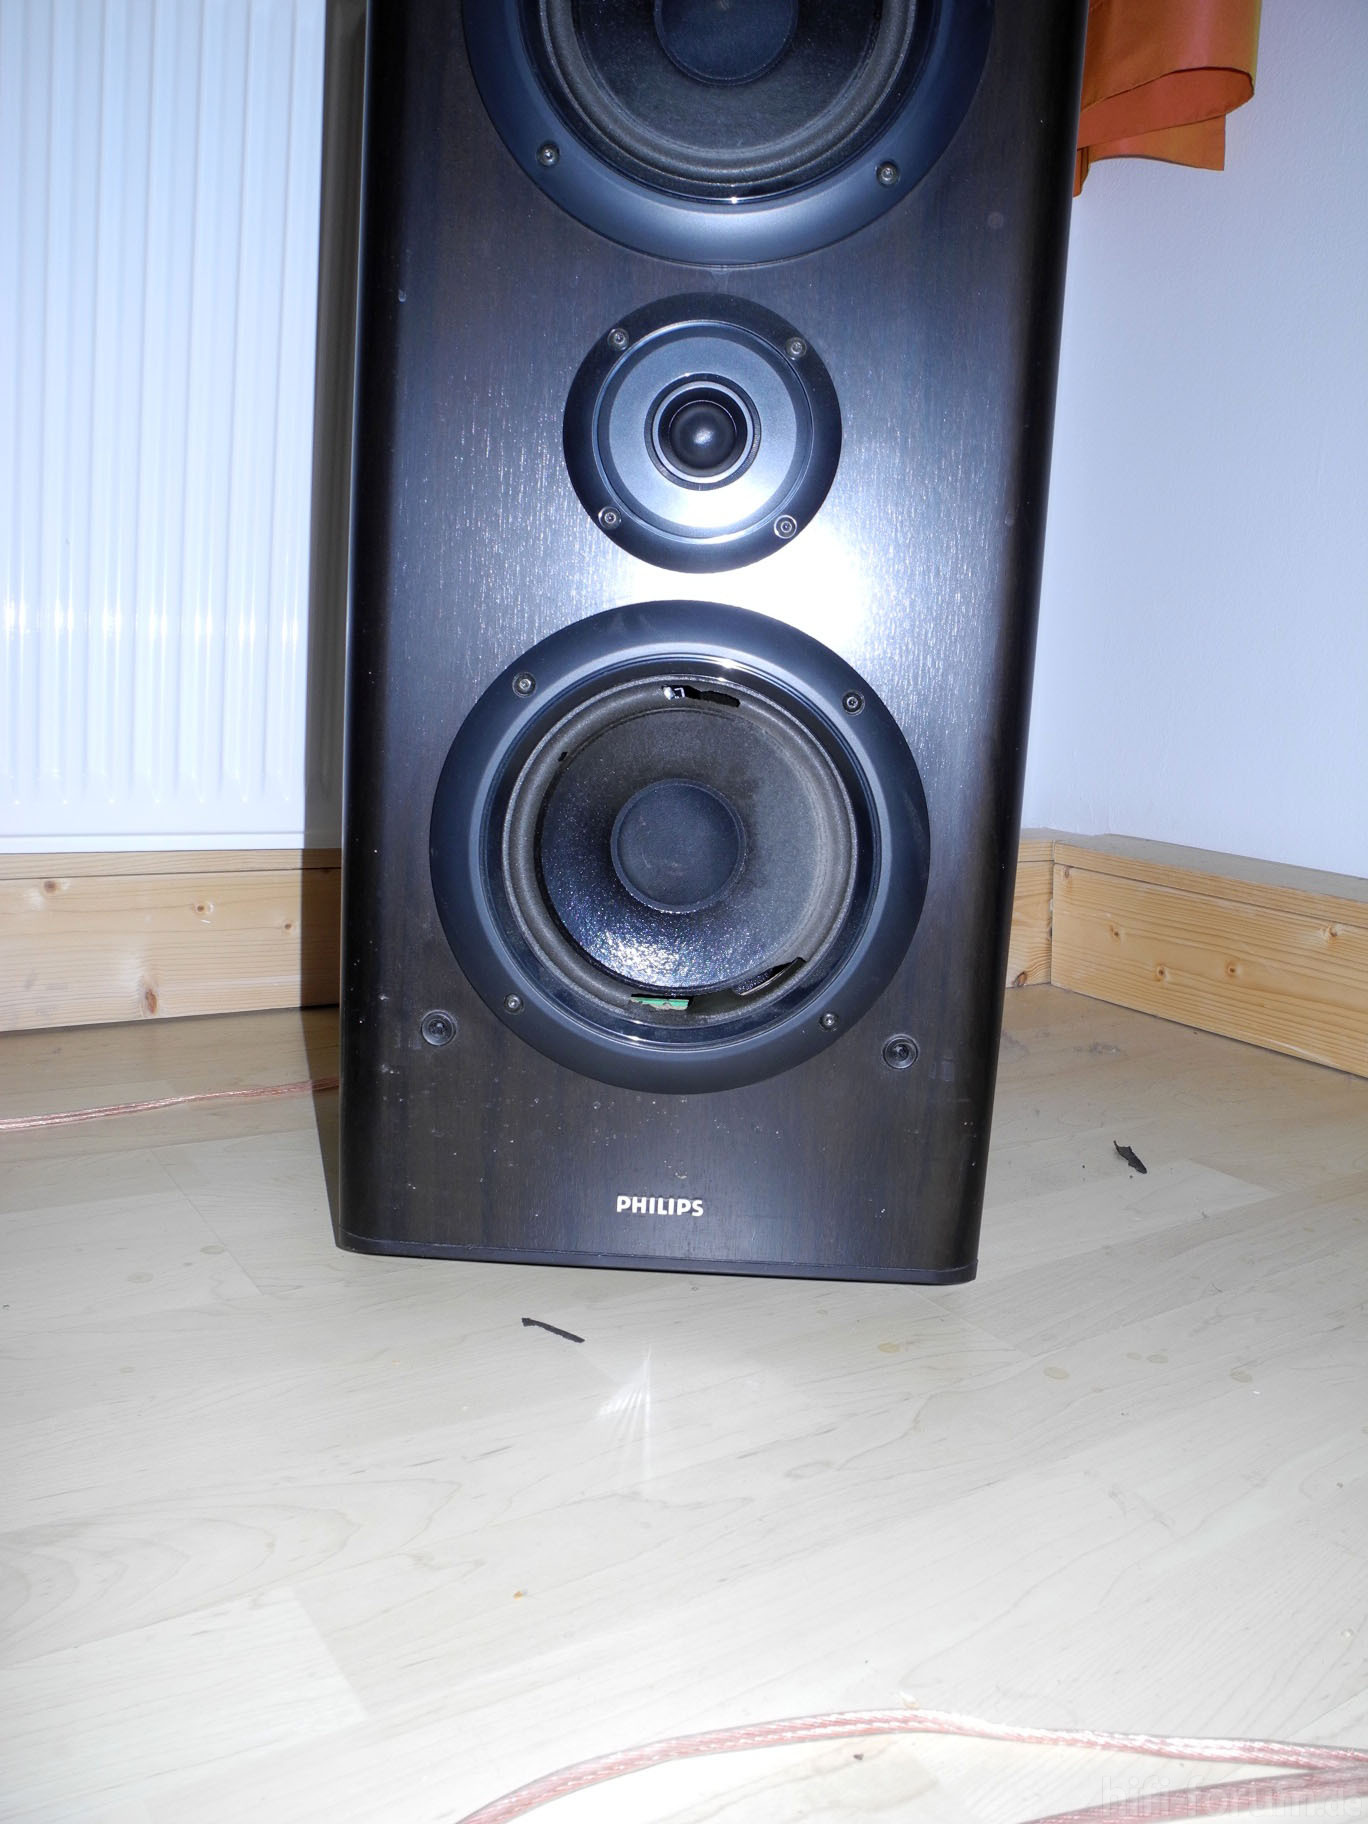 Defekte Lautsprecher Reparieren Philips 900er Reihe Lautsprecher